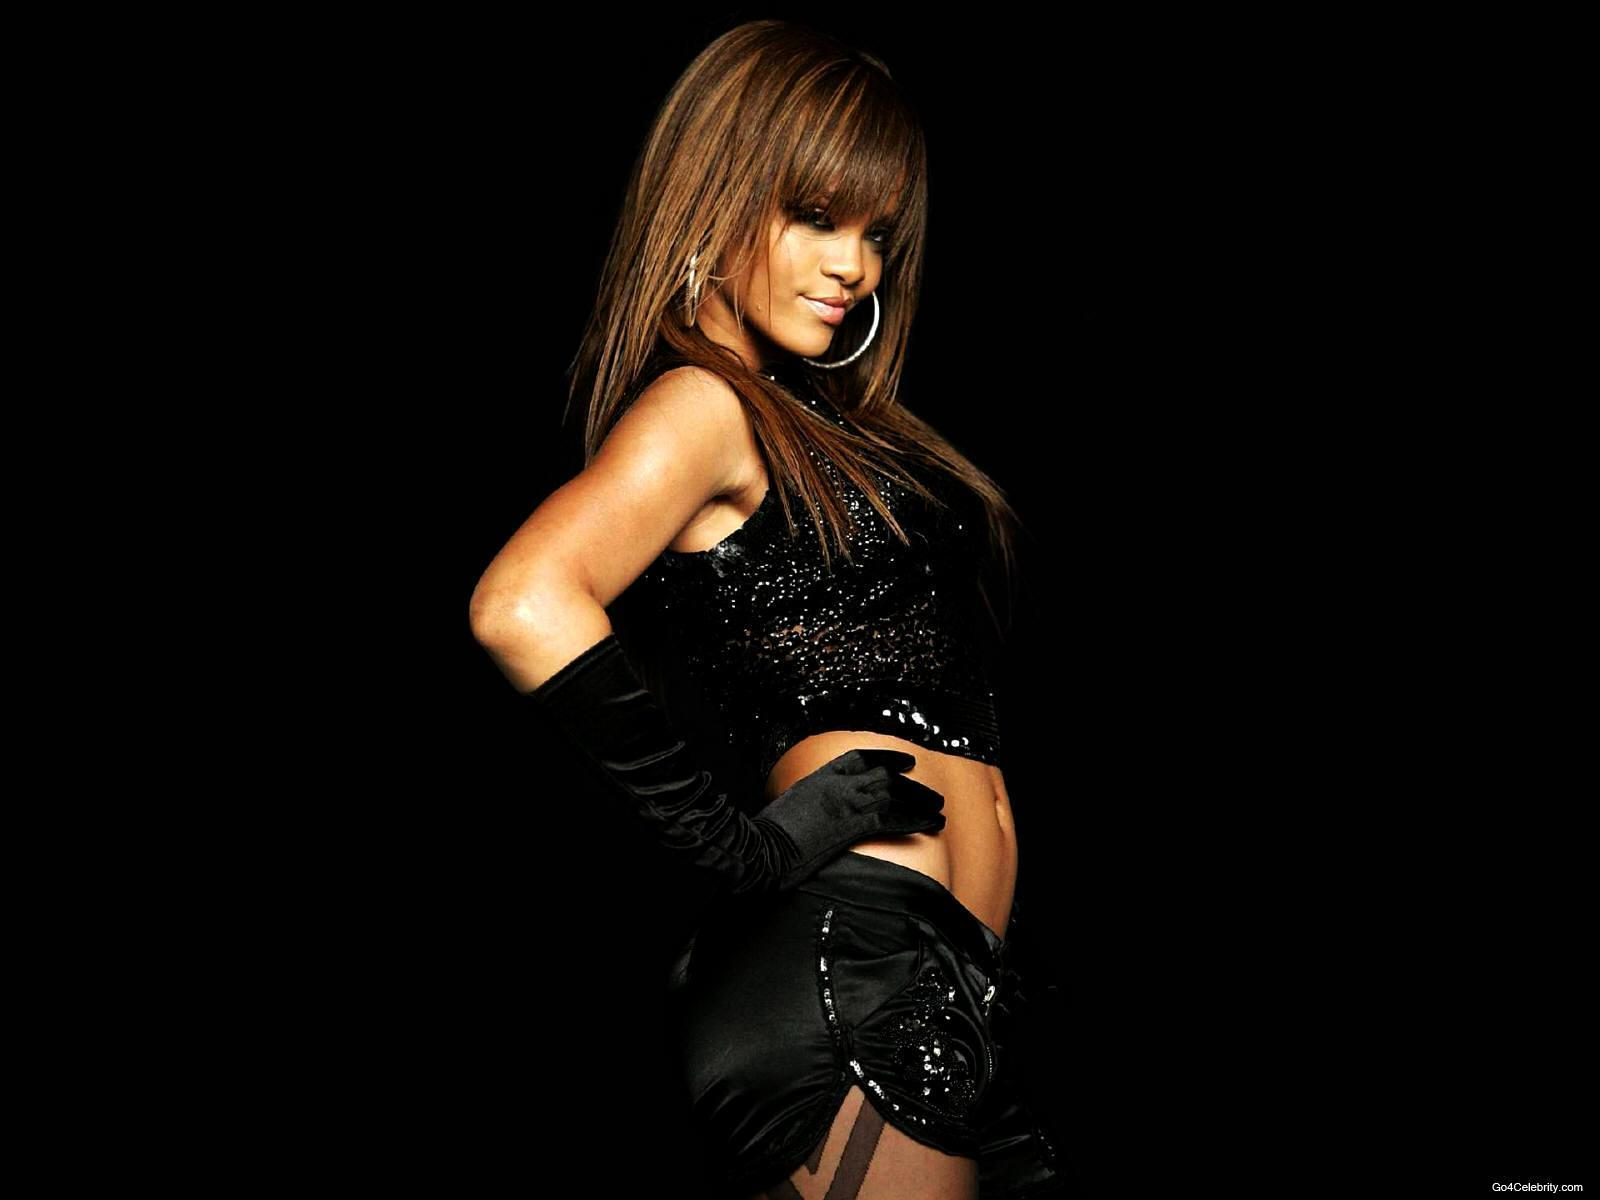 http://images2.fanpop.com/images/photos/6800000/Rihanna-rihanna-6848064-1600-1200.jpg